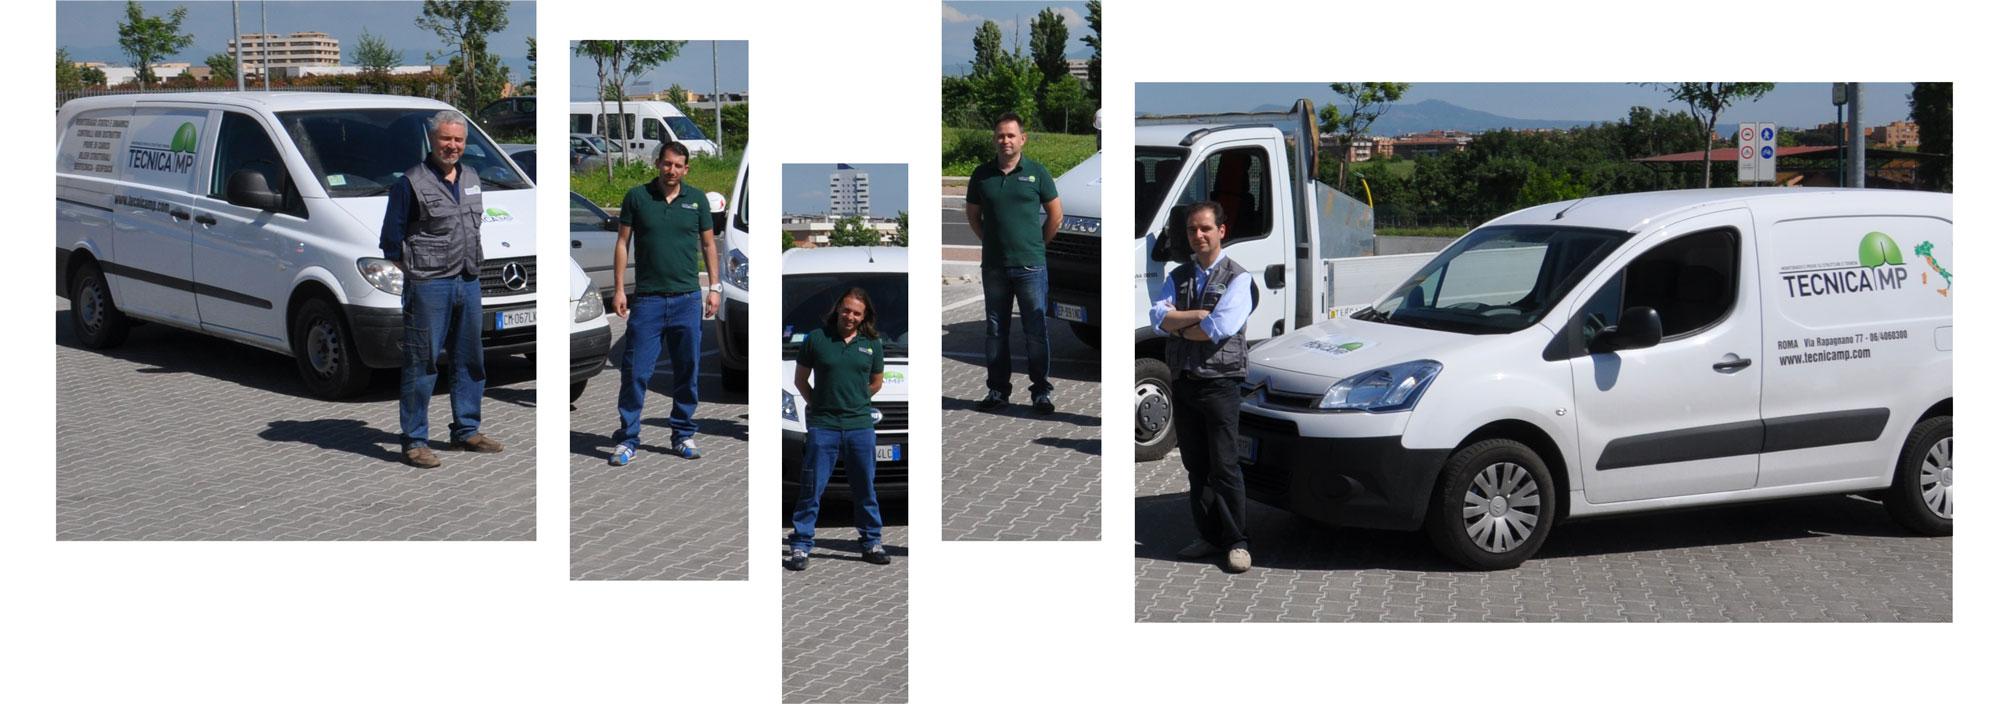 tecnicamp-team